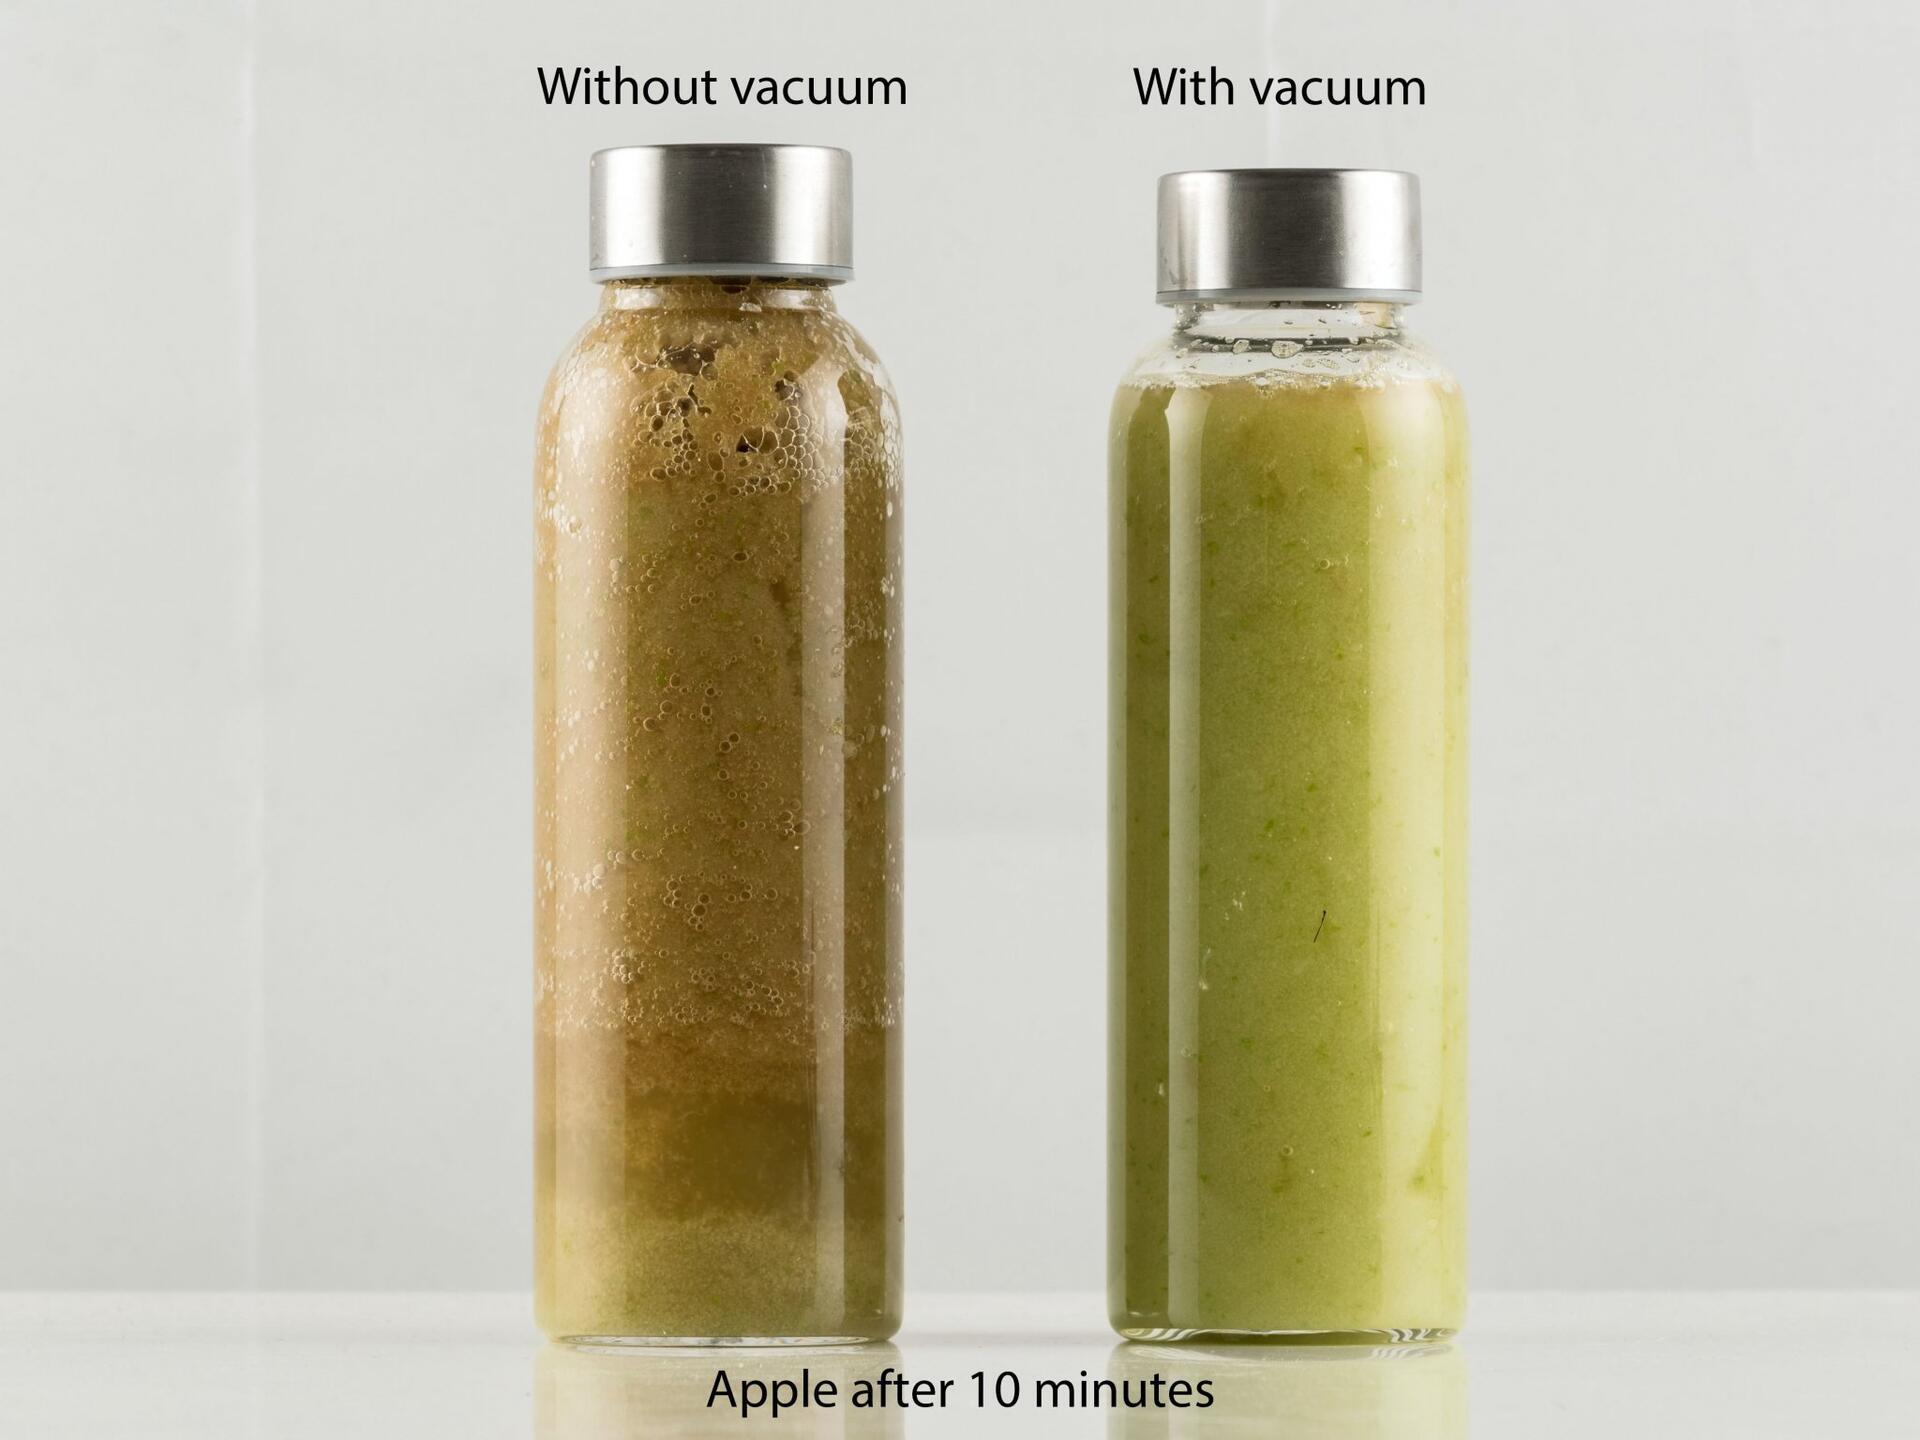 Vidia Vakuum-Standmixer-Test: Apfel nach 10 Minuten Ruhezeit | EUJUICERS.DE